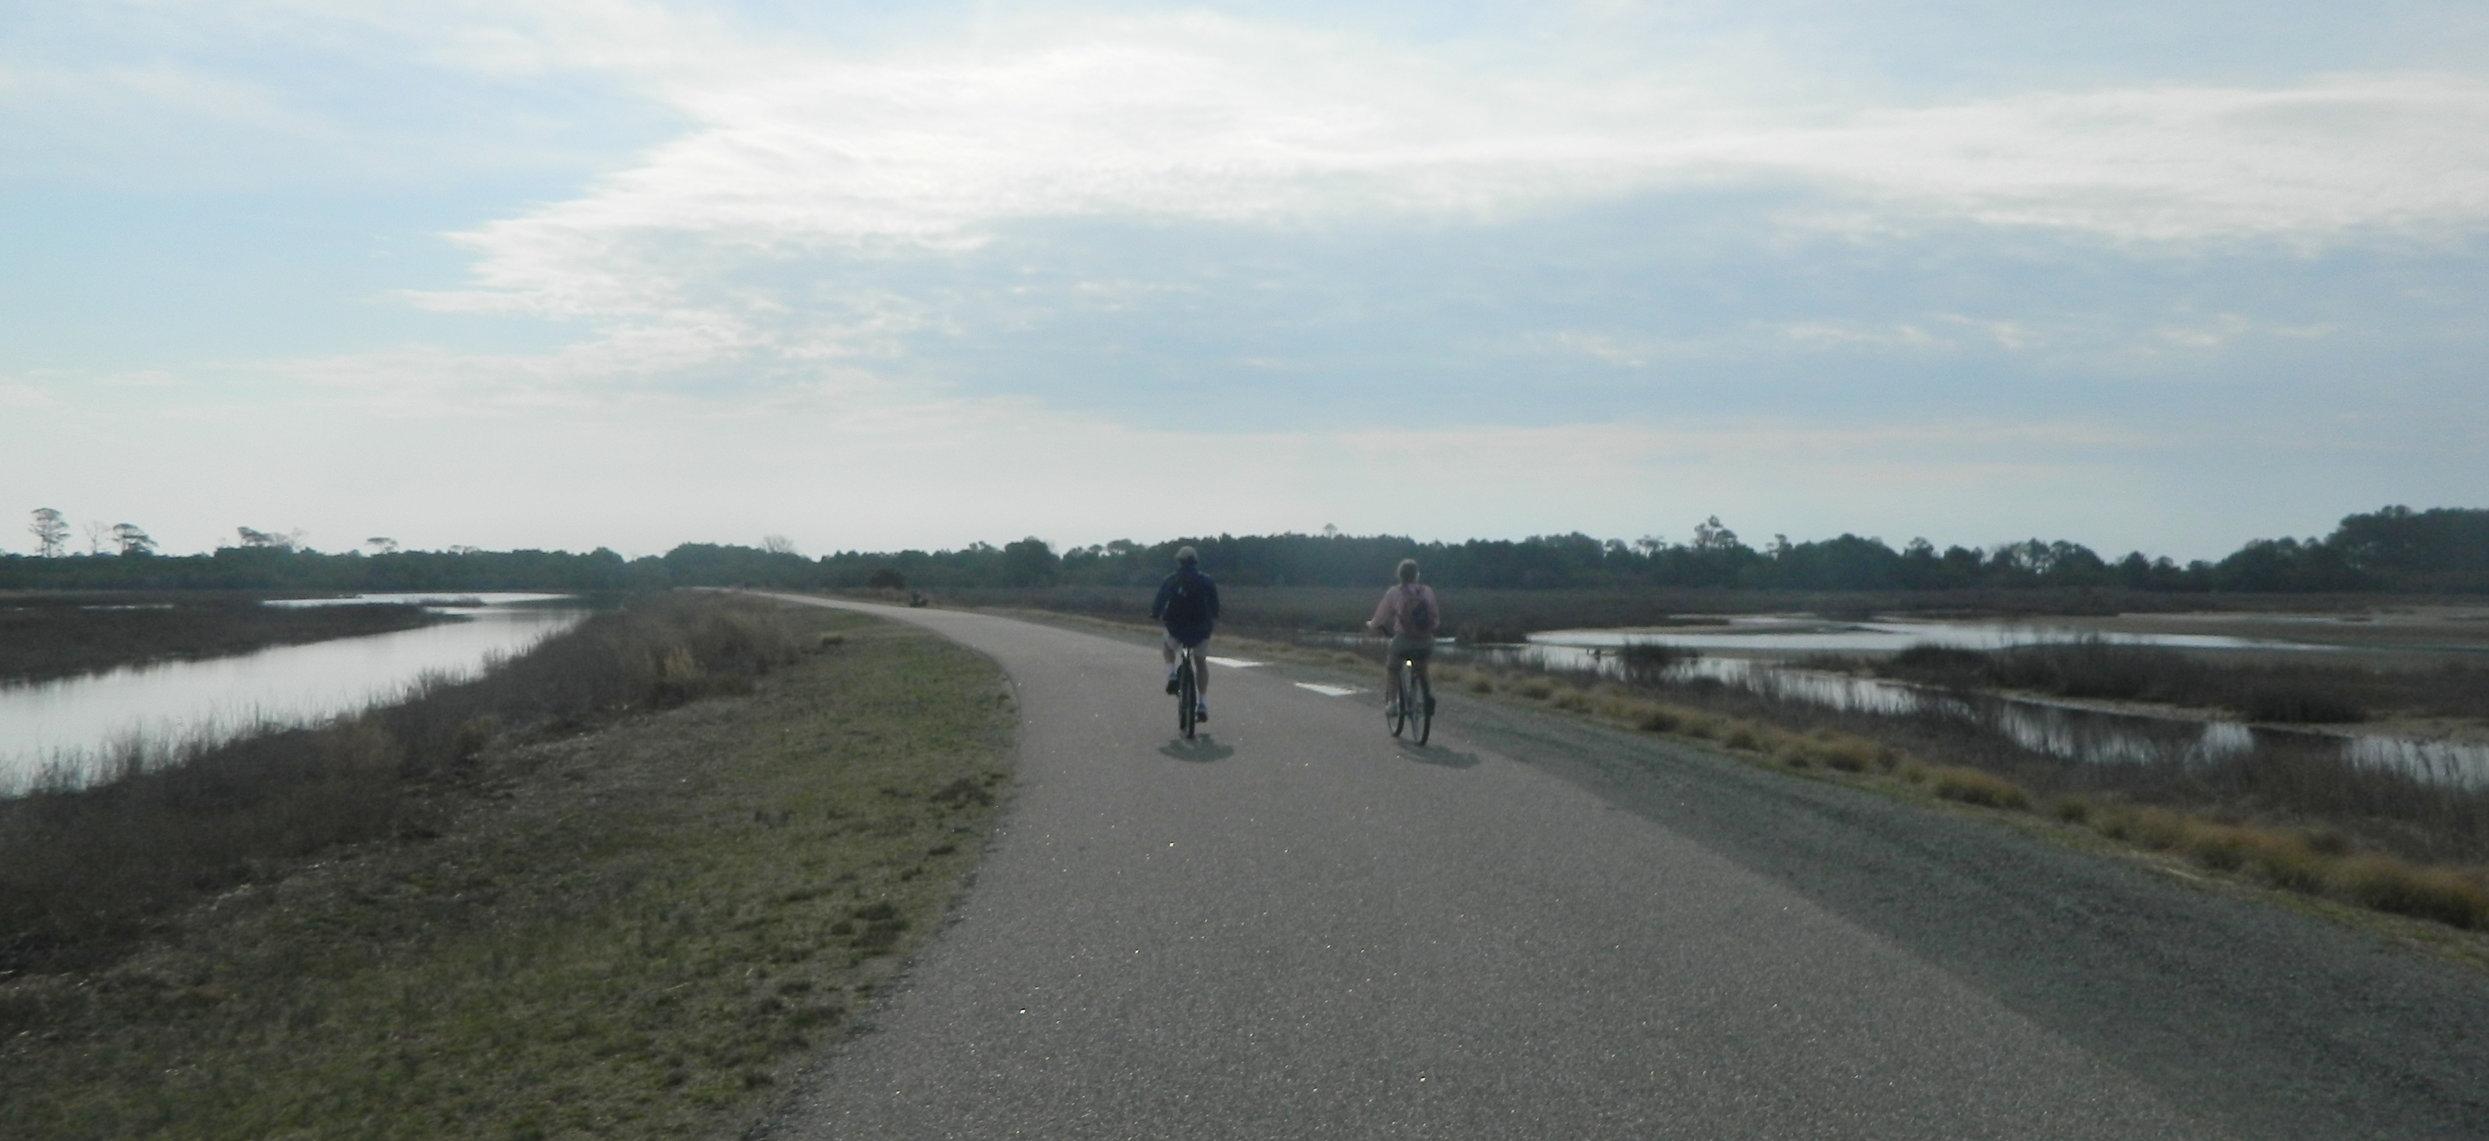 My parents cycle along through the wetlands at Assateague Island National Seashore.